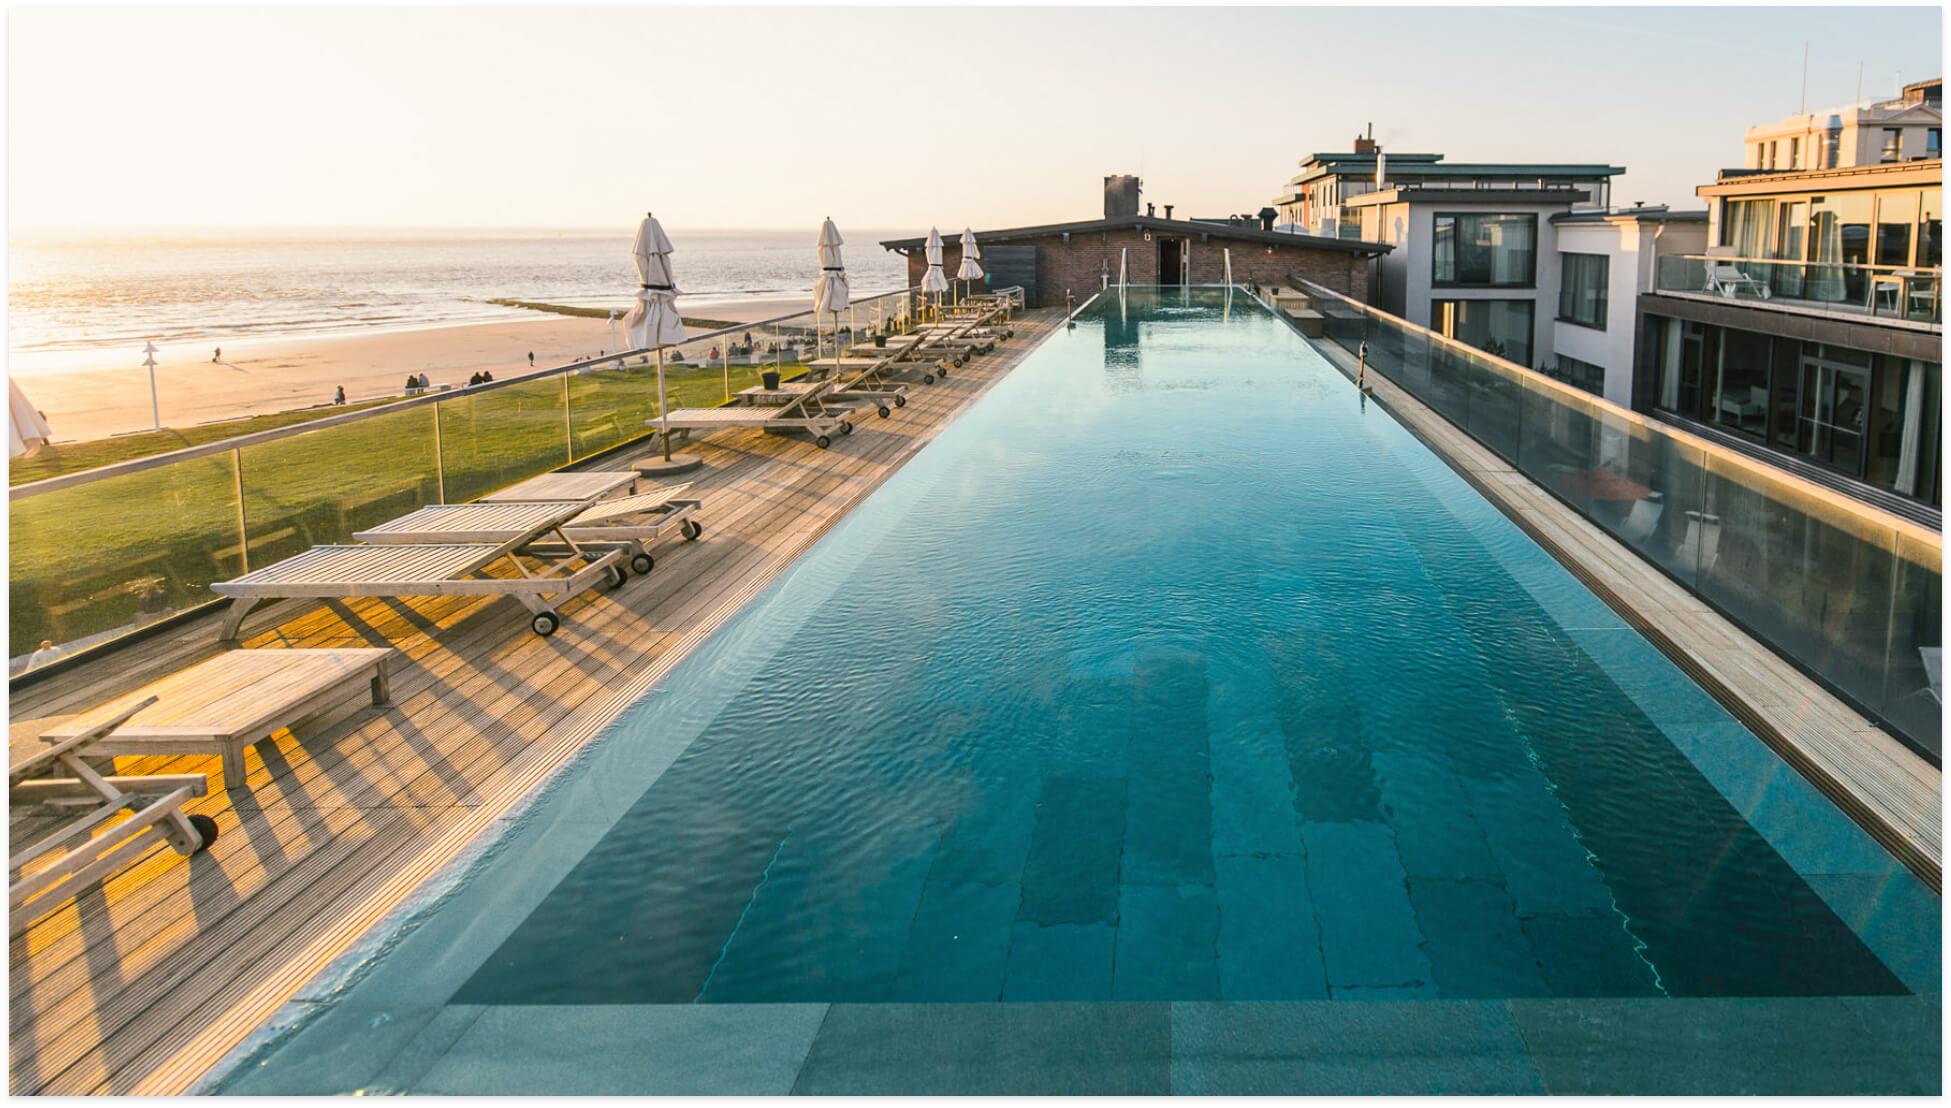 Seesteg-Norderney Pool